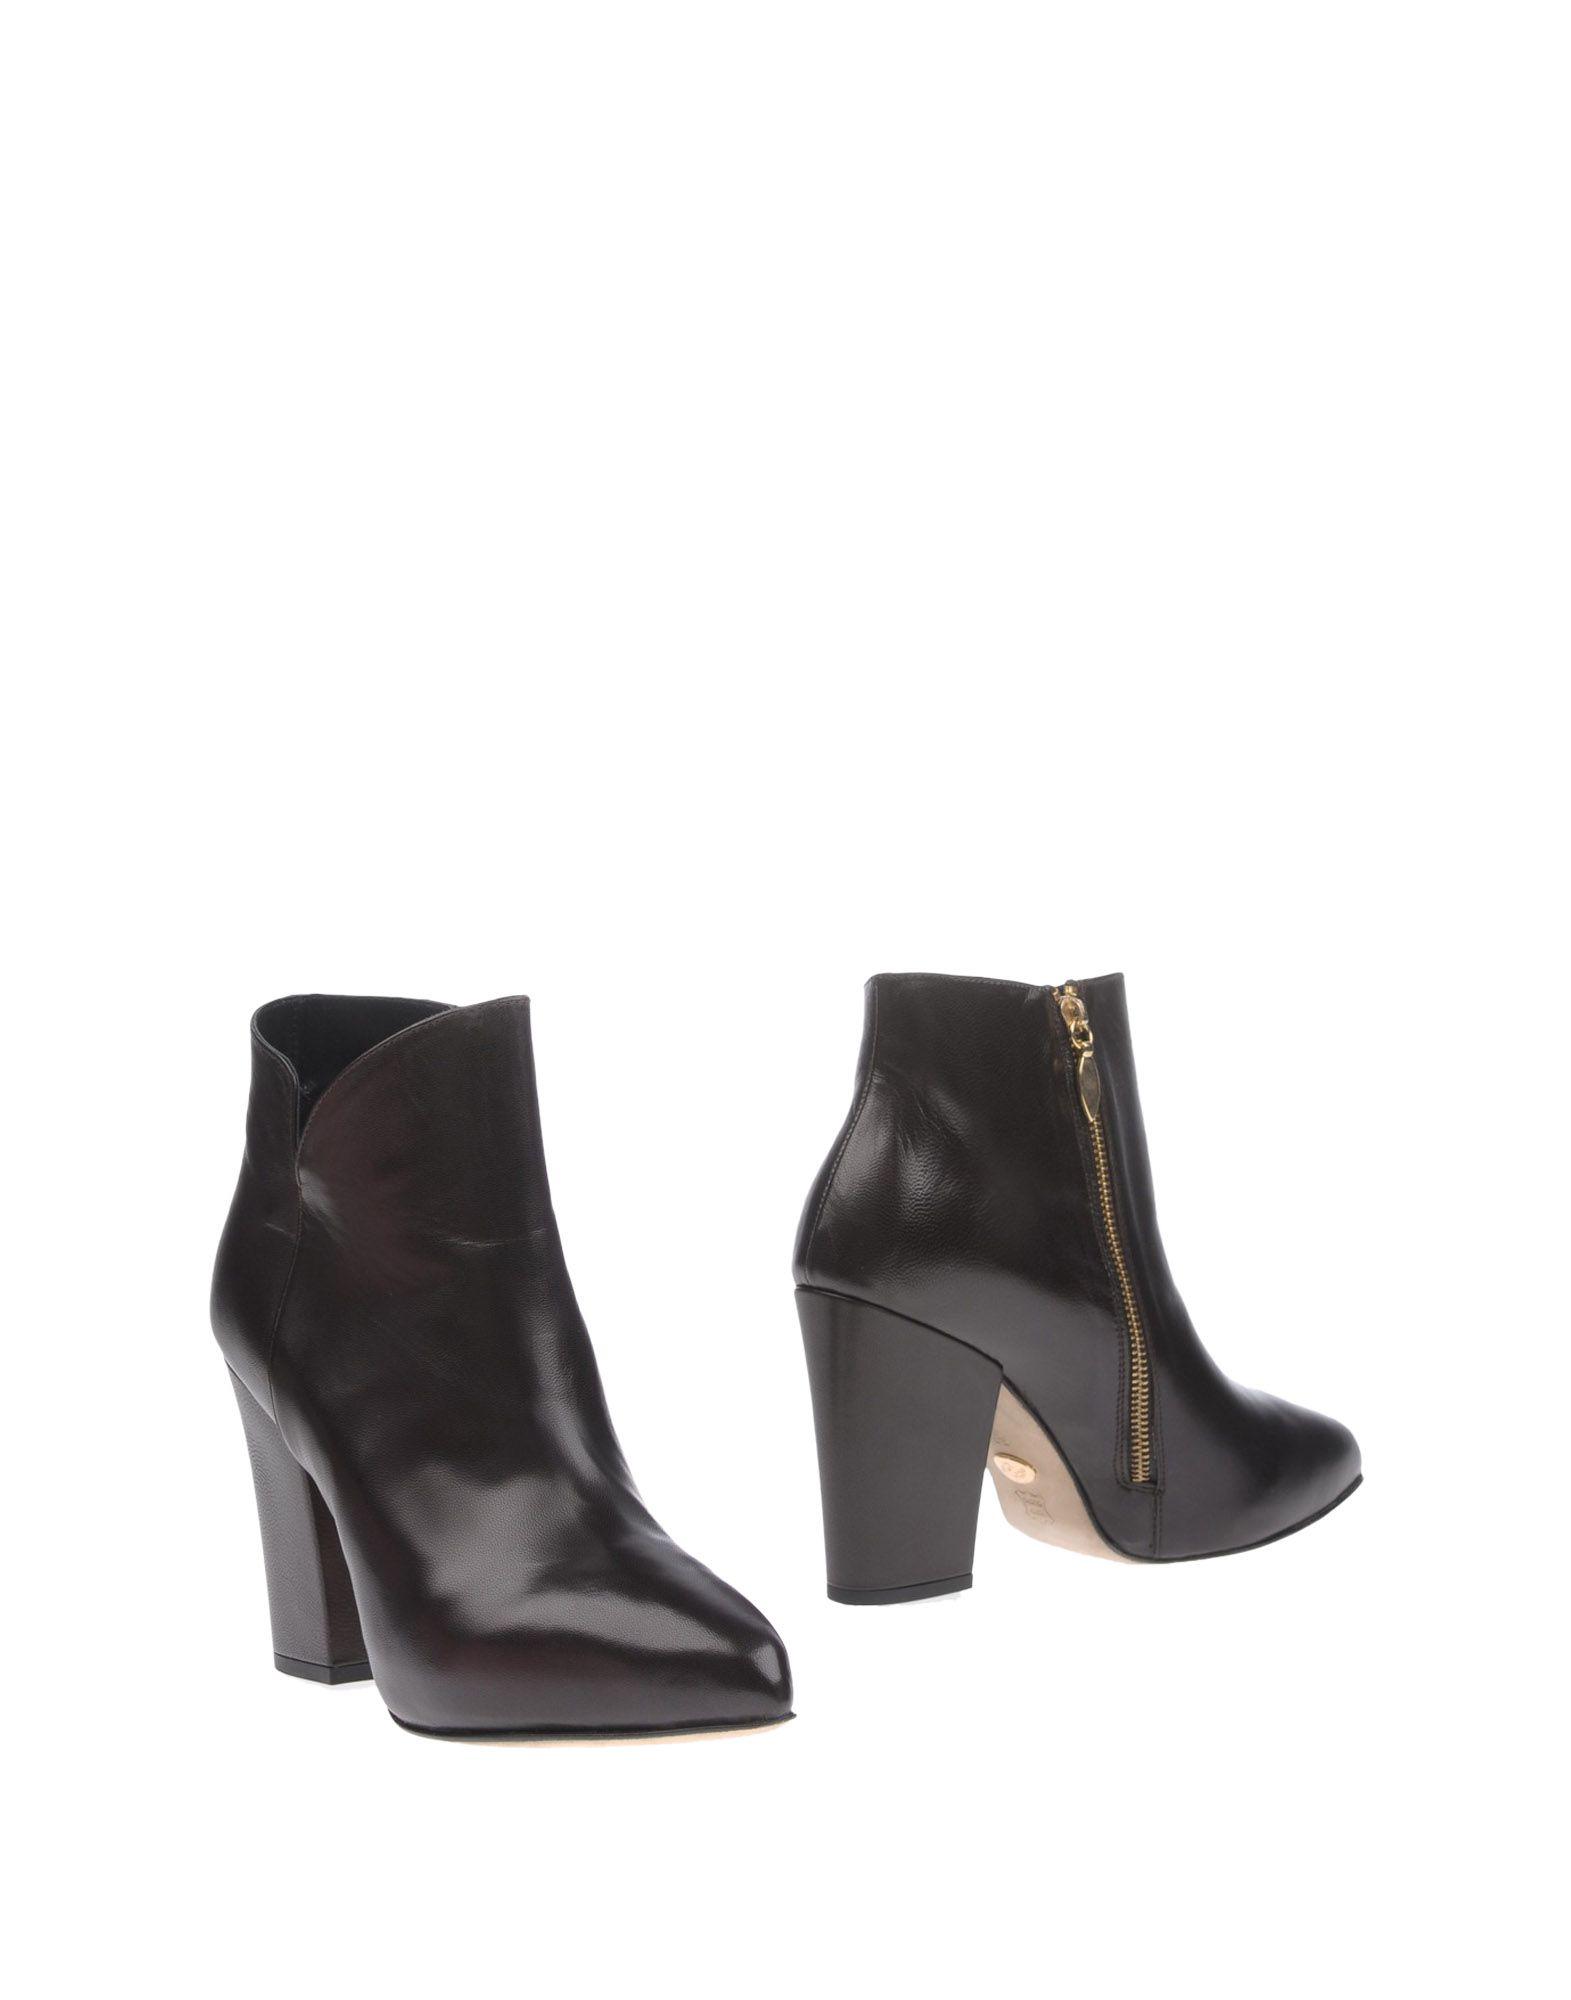 Rêve Damen D'un Jour Stiefelette Damen Rêve  11220878LK Gute Qualität beliebte Schuhe 44851c